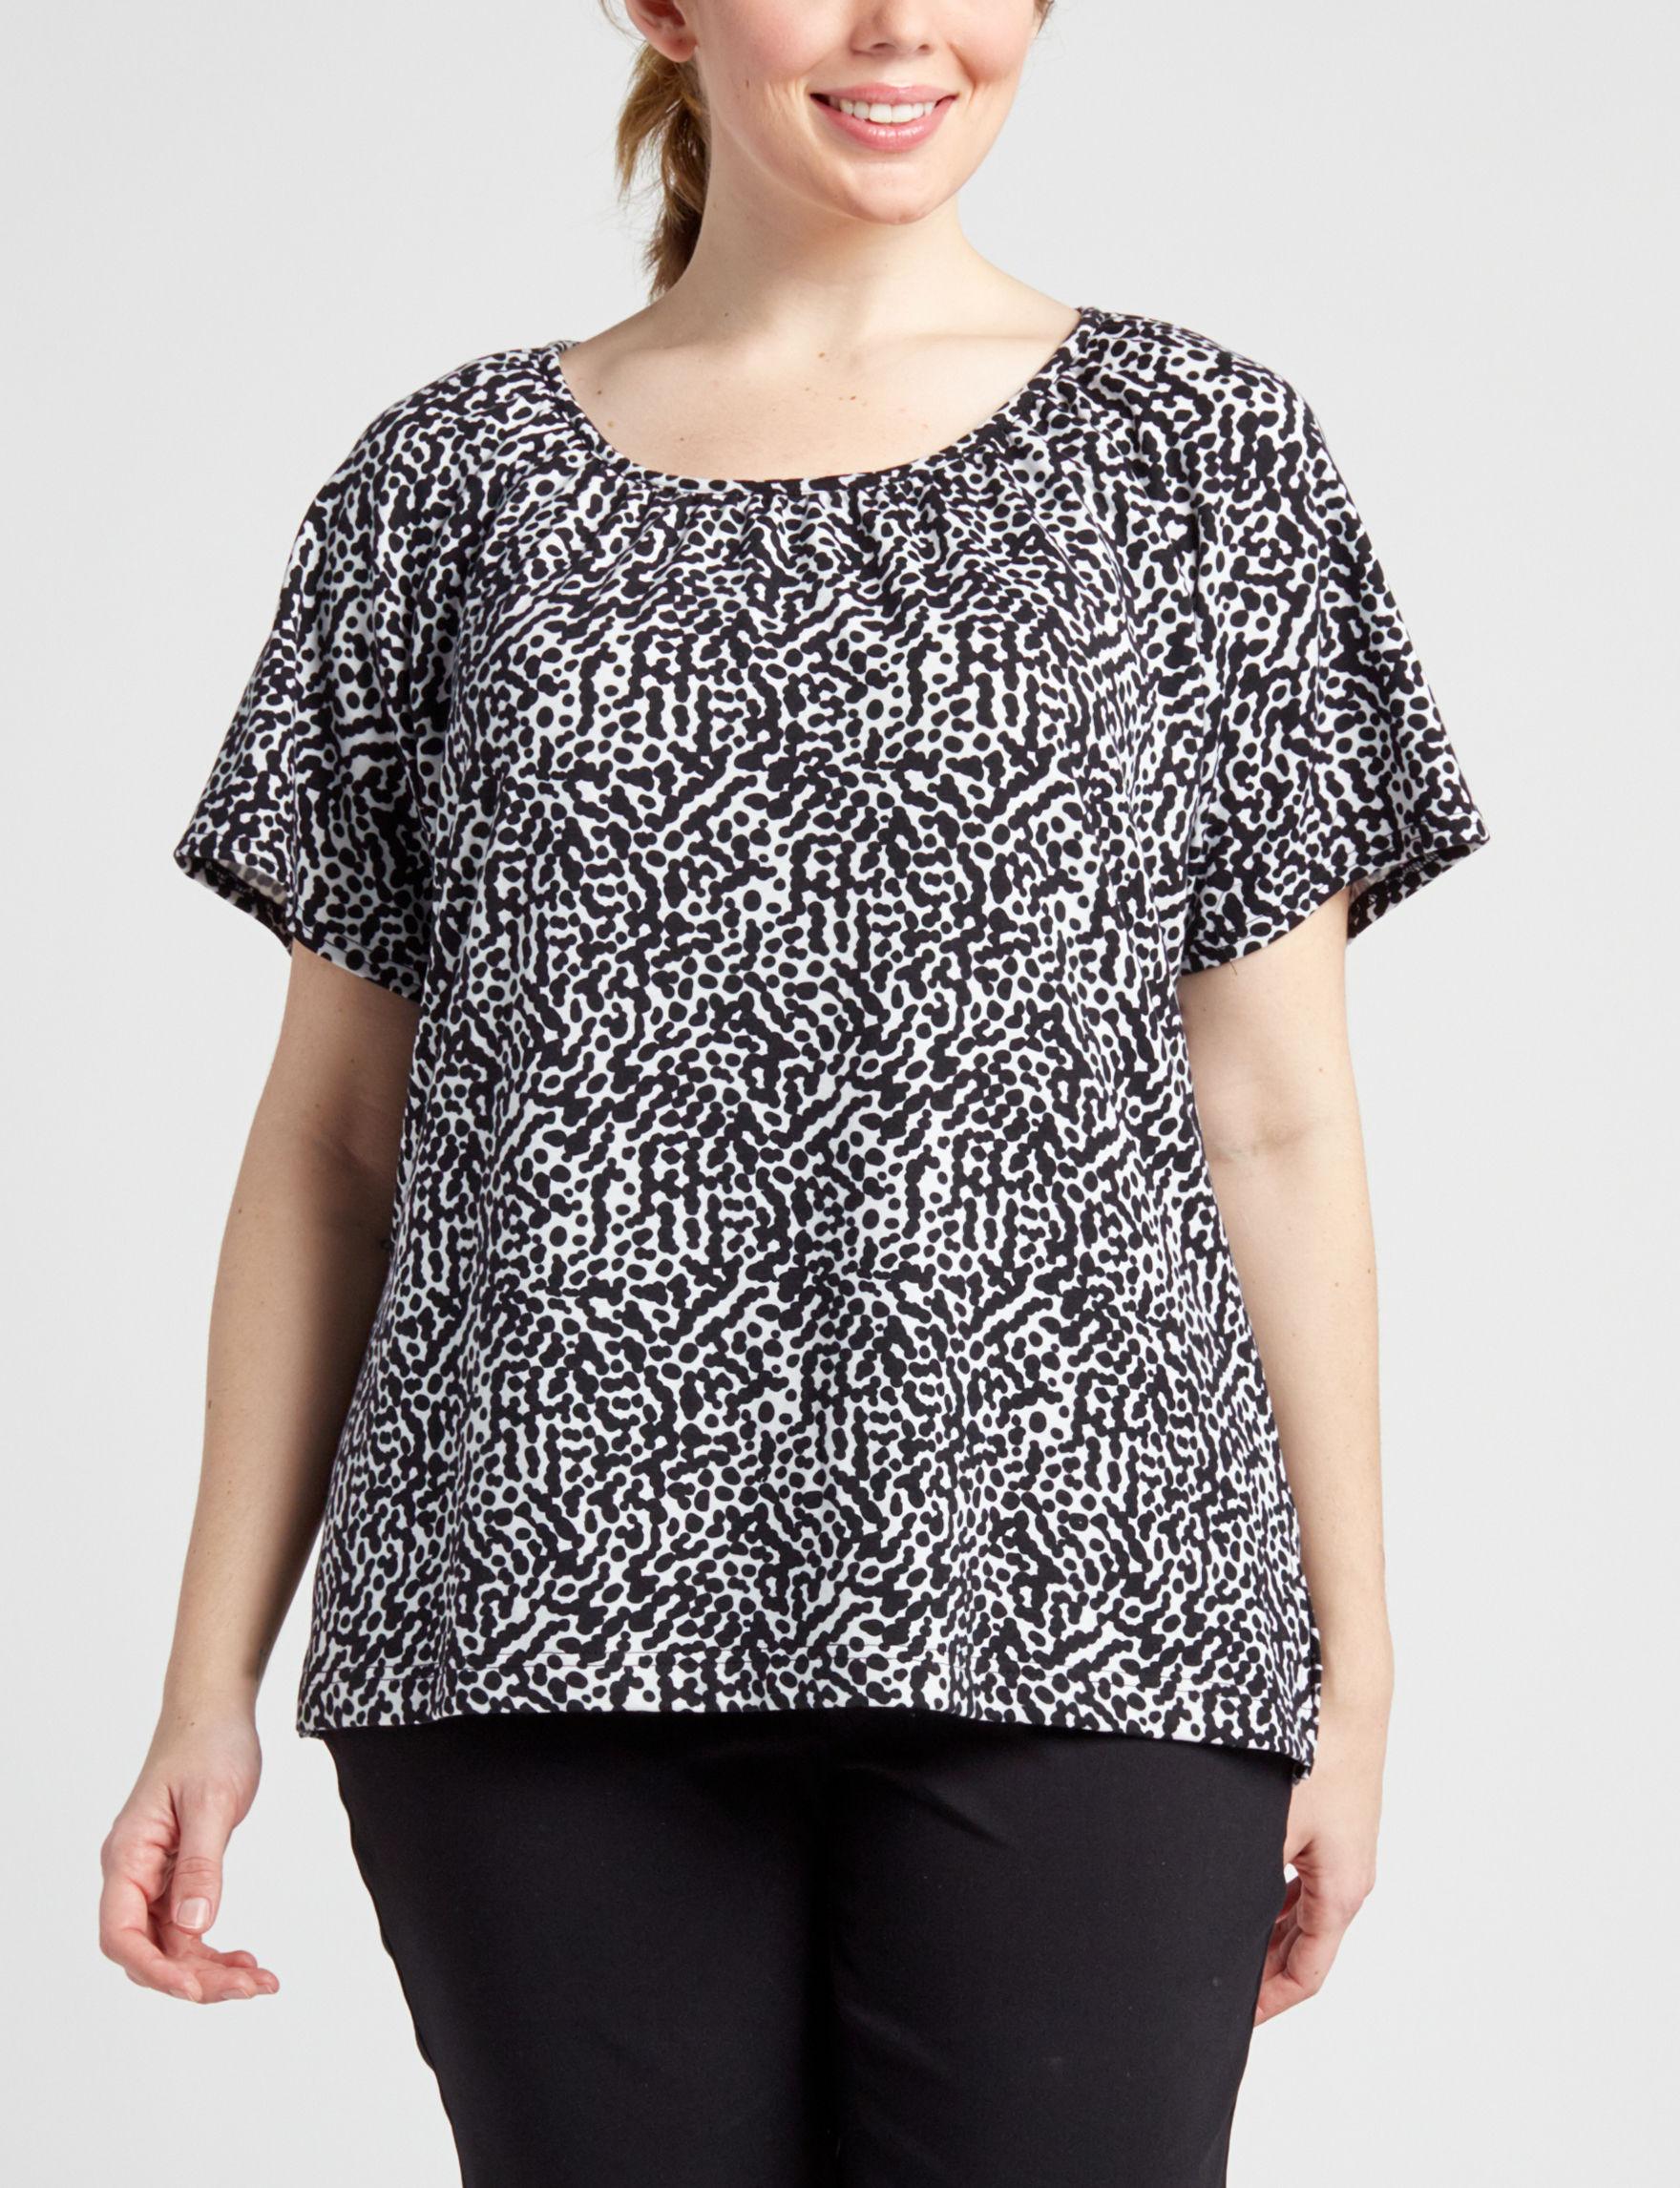 Cathy Daniels Black /  White Shirts & Blouses